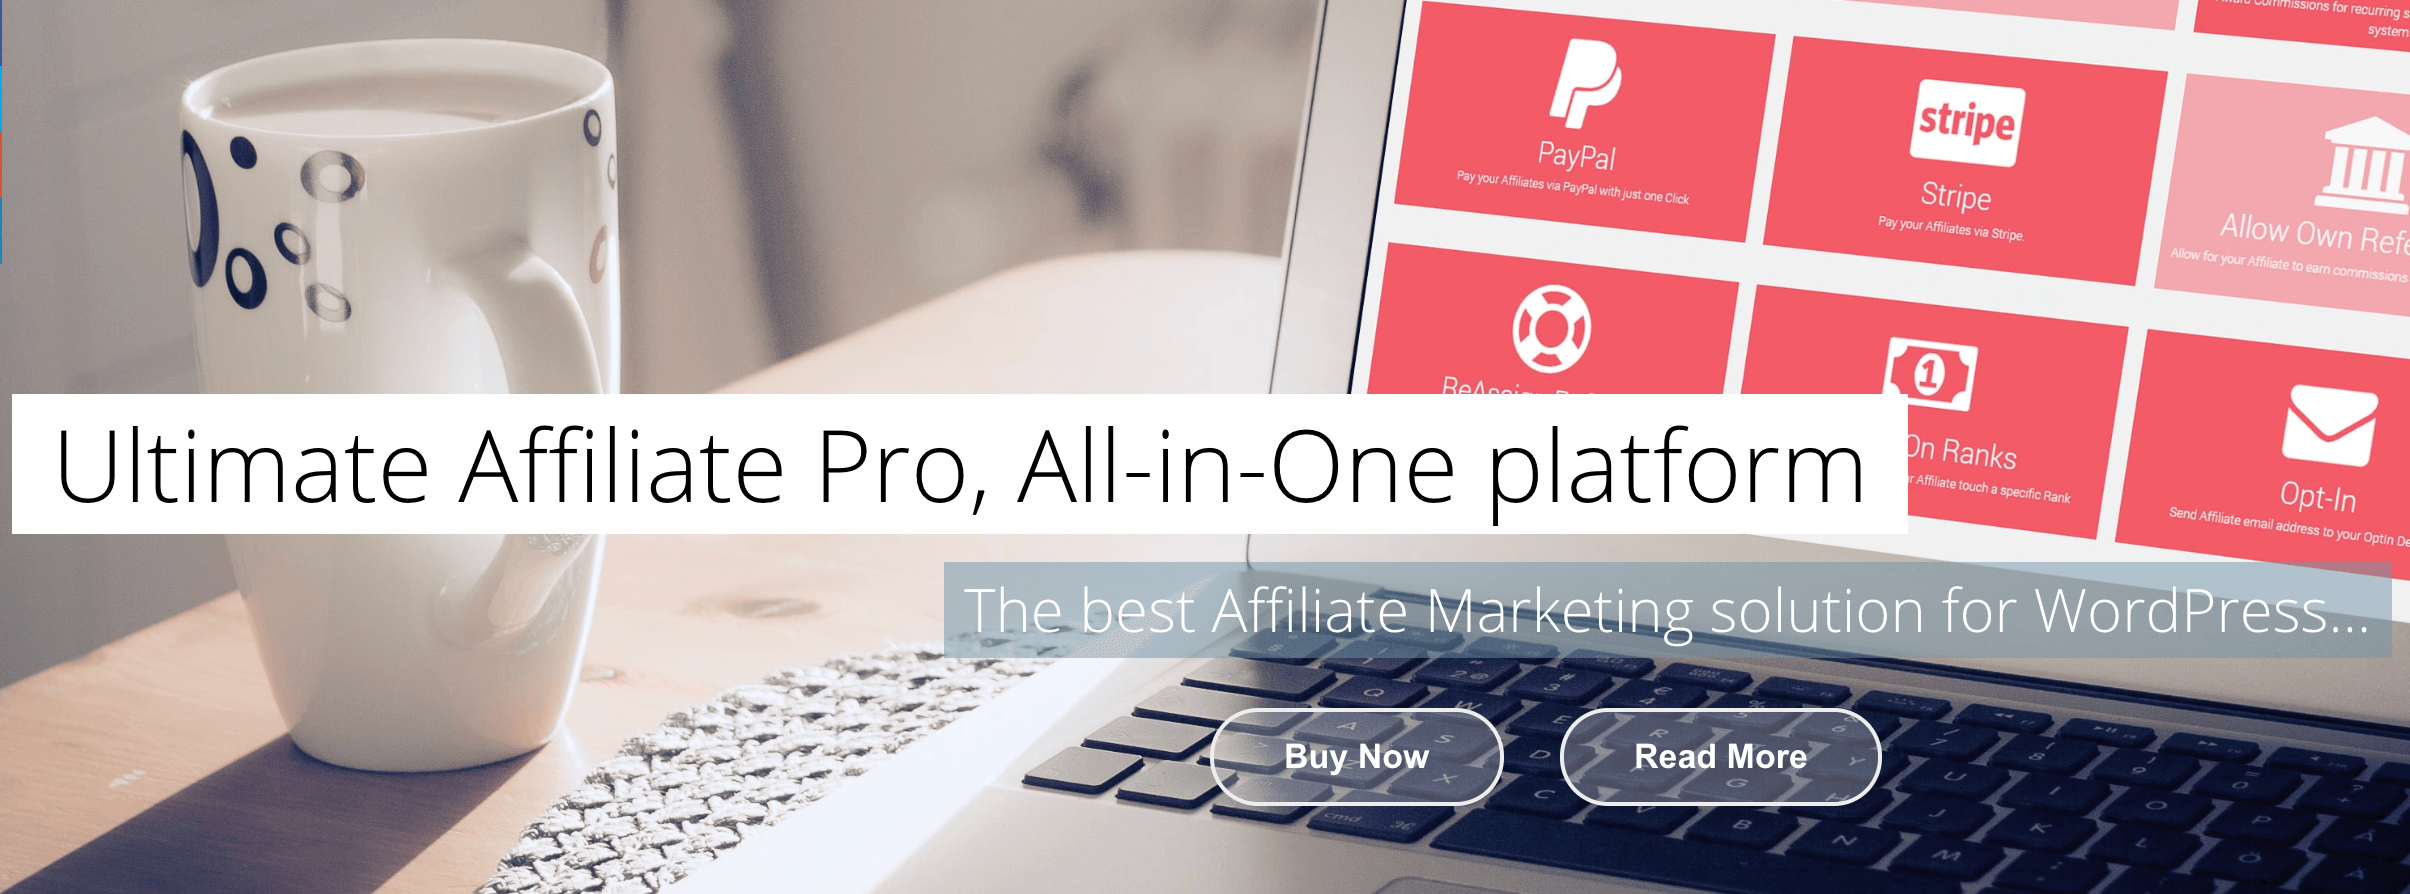 The Ultimate Affiliate Pro plugin.